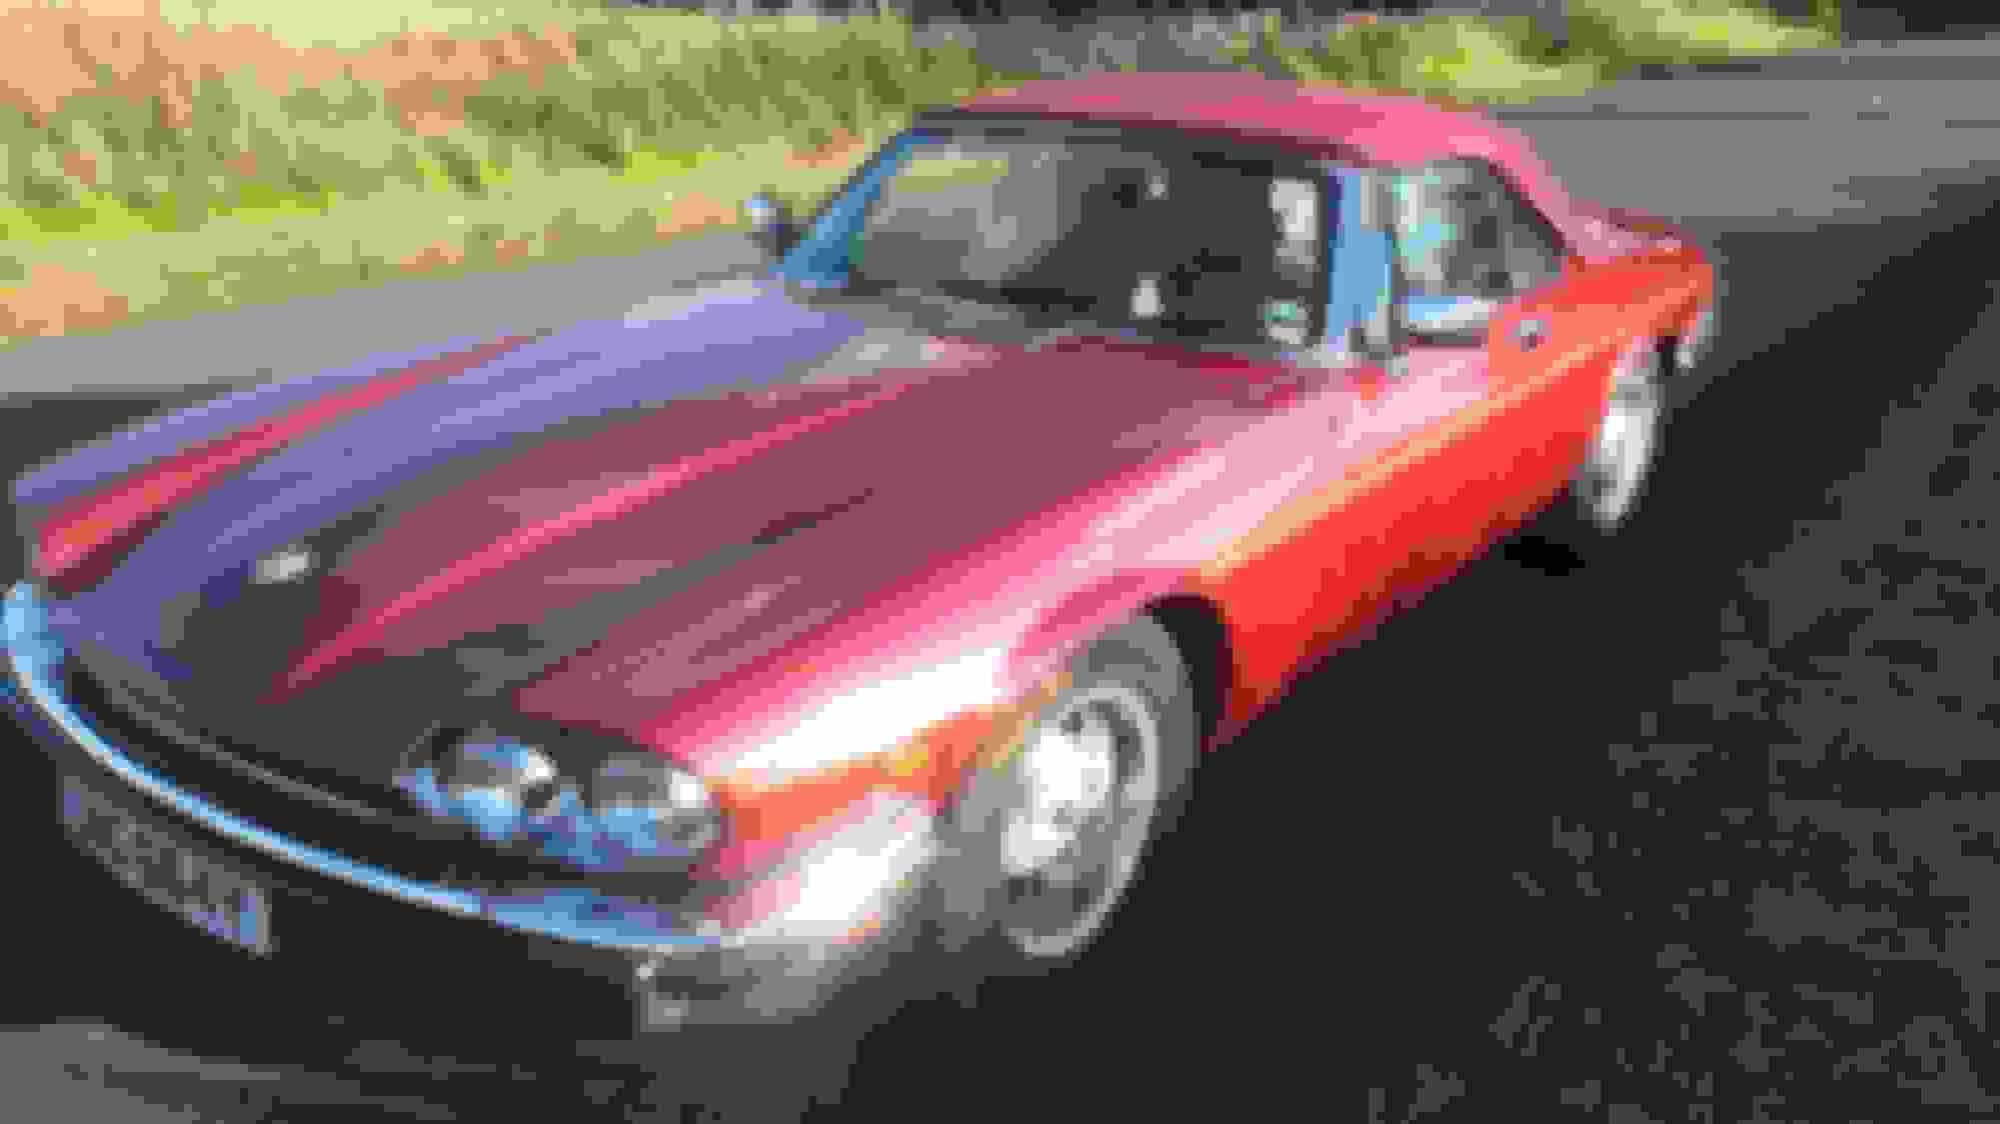 hight resolution of xj6 xj40 vanden plas radio upgrade jaguar forums jaguar 1992 jaguar vanden plas xj40 stereo wiring